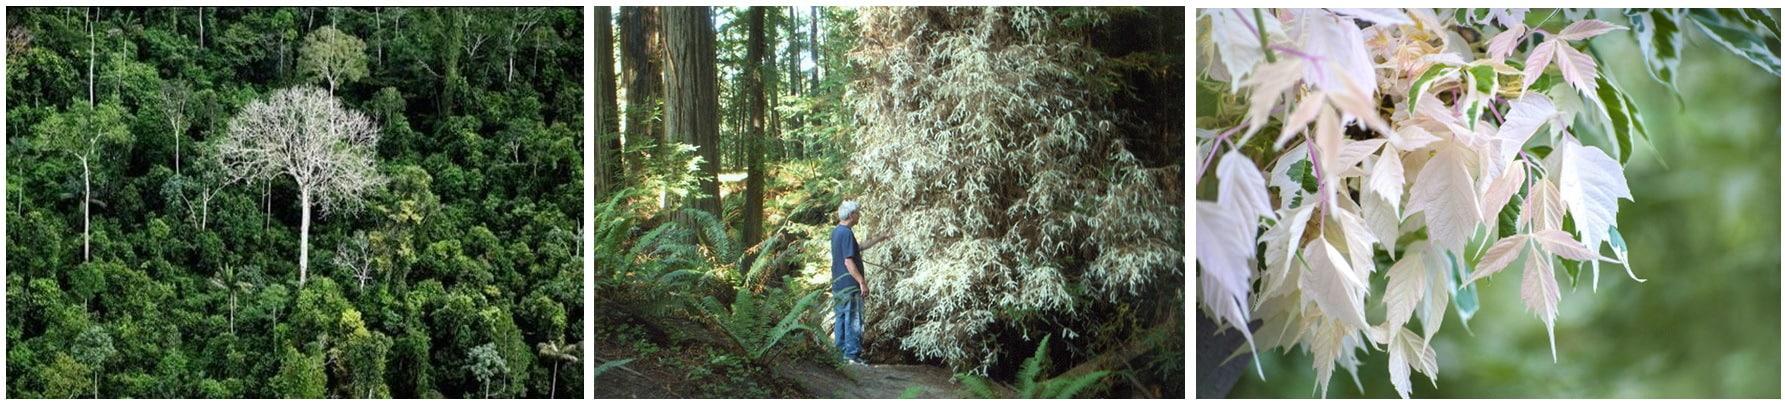 Свойства дерева сиквои